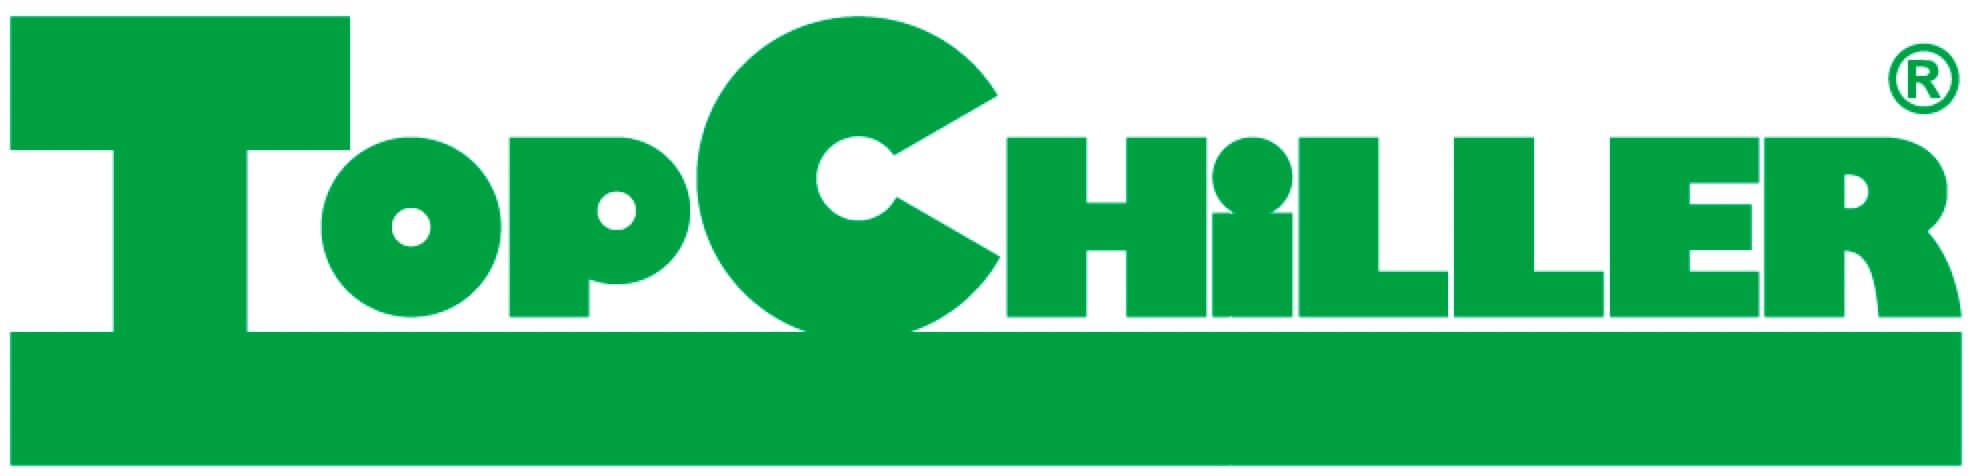 TopChiller Logo